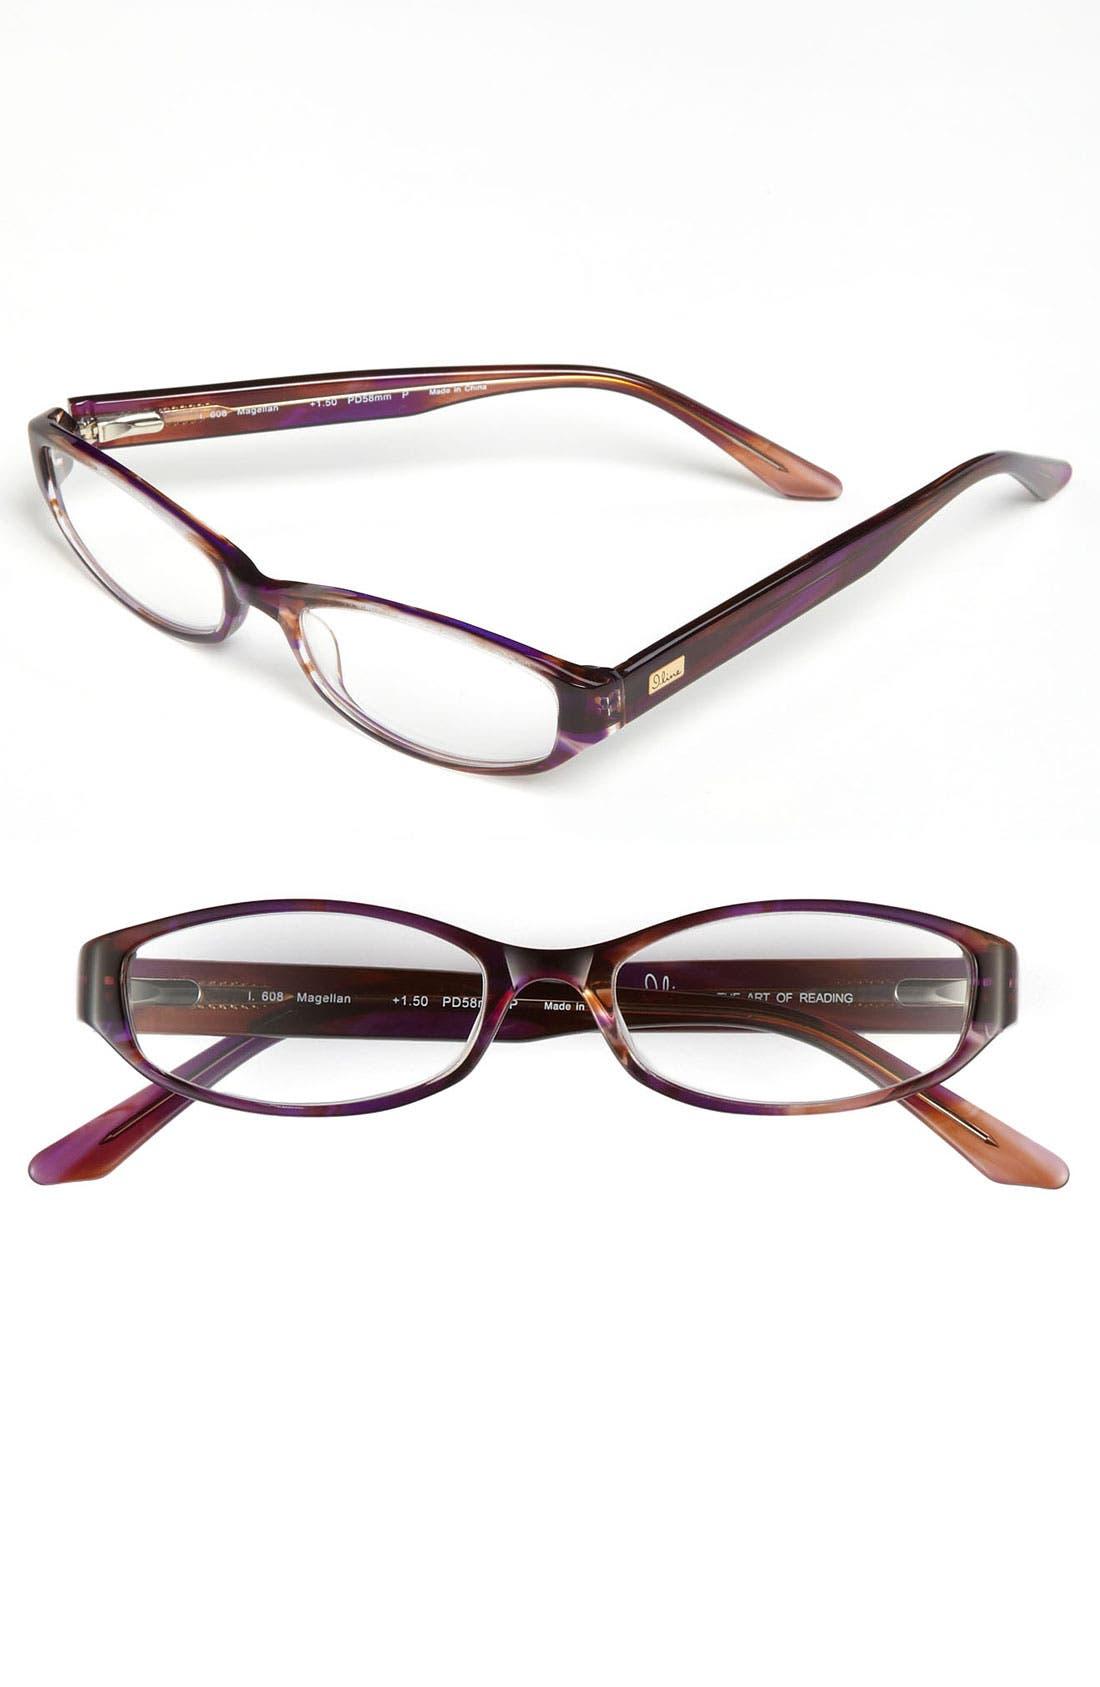 Alternate Image 1 Selected - I Line Eyewear 'Magellan' Reading Glasses